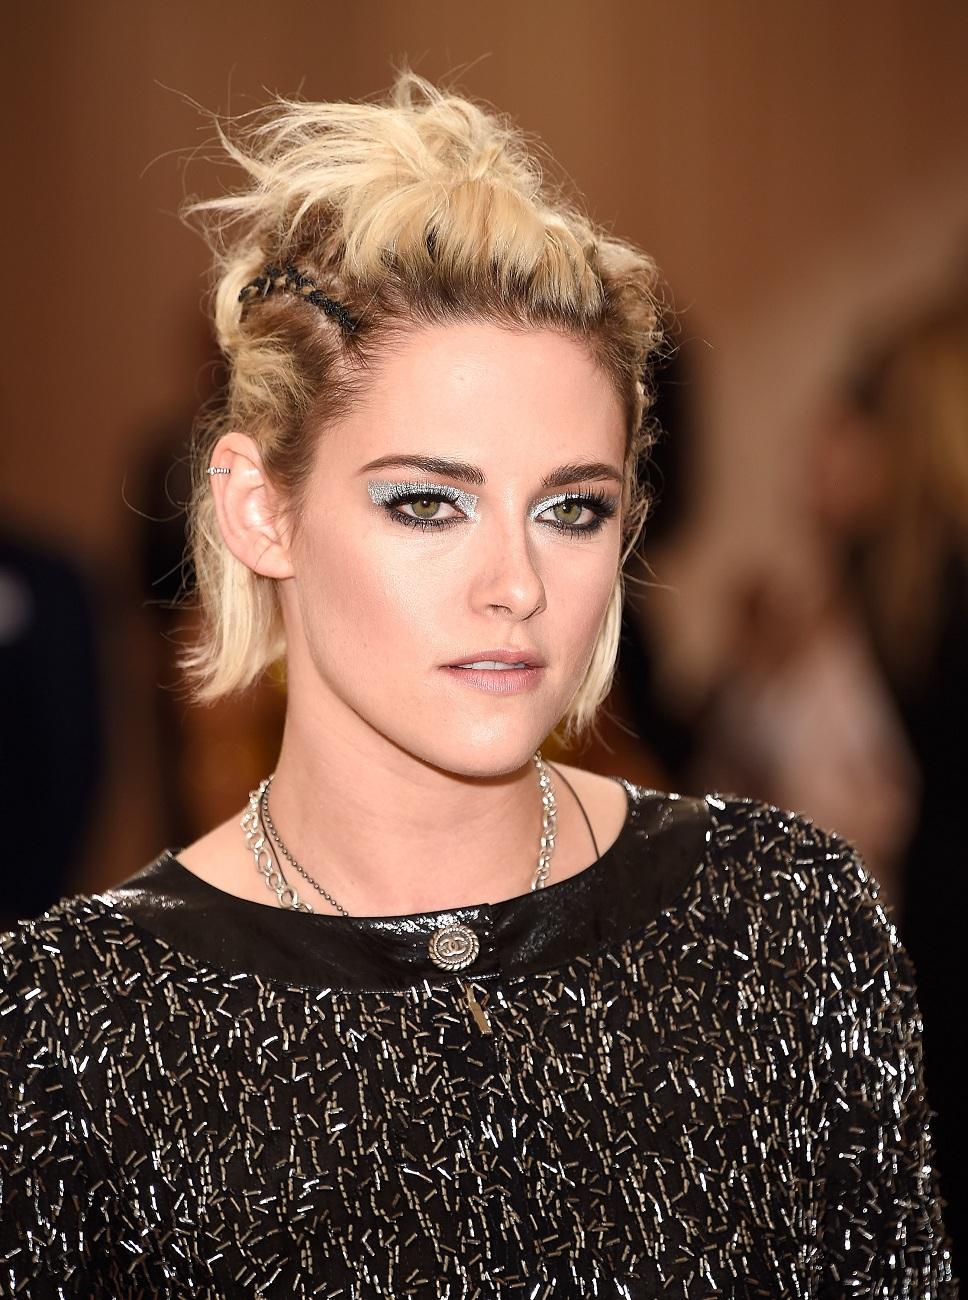 Met Gala 2016 Chanel Fashionela